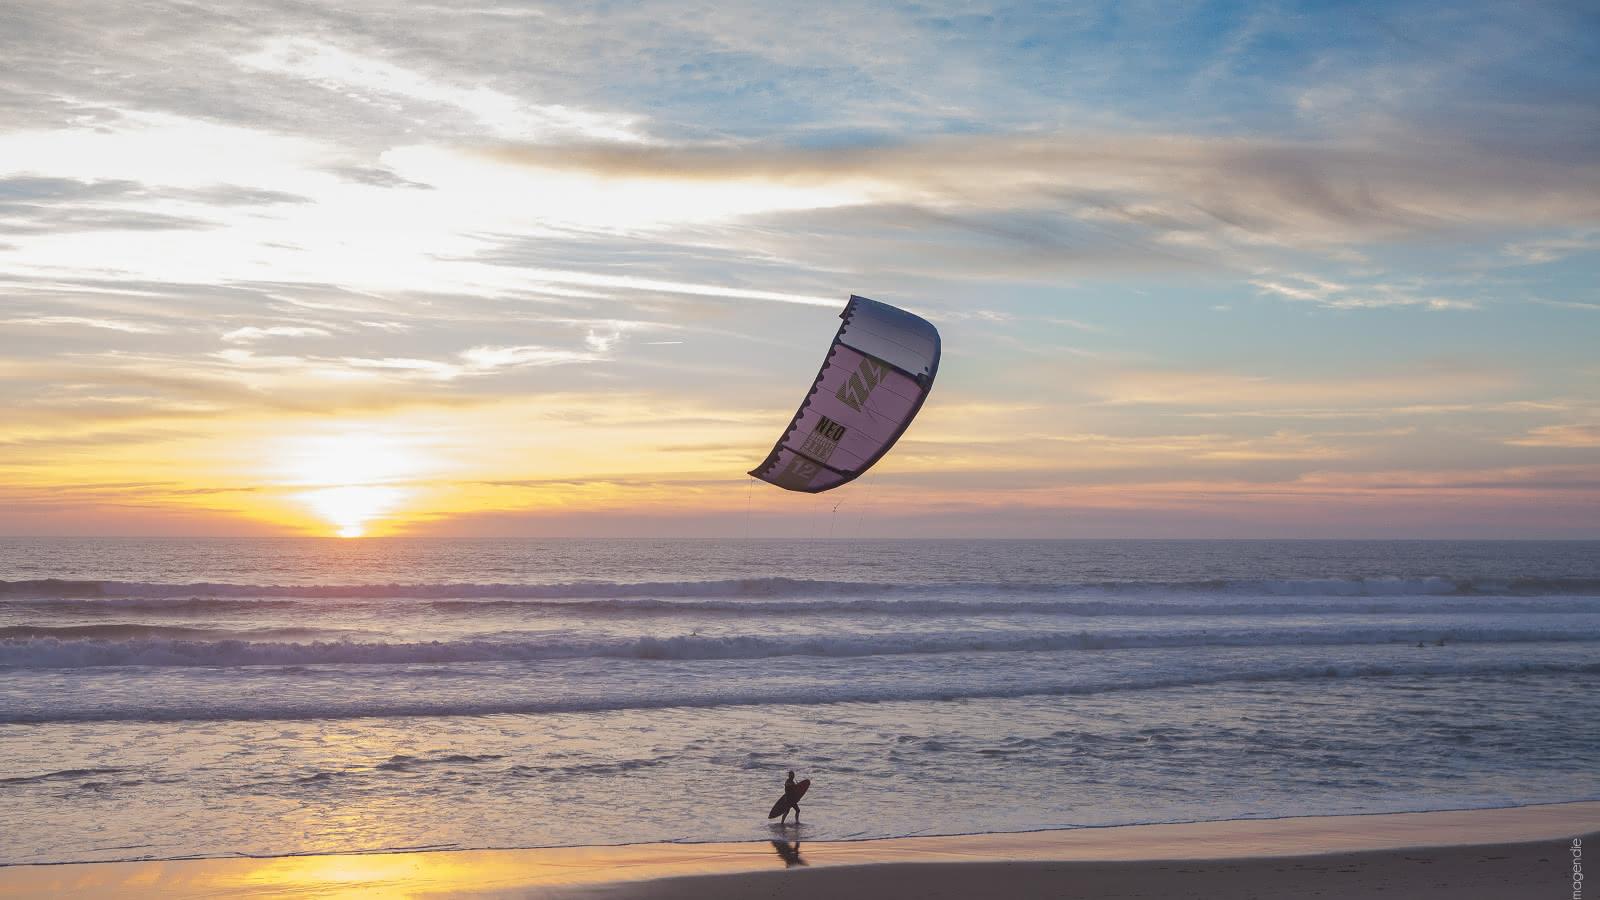 Kitesurf 2 - © Isabelle Magendie